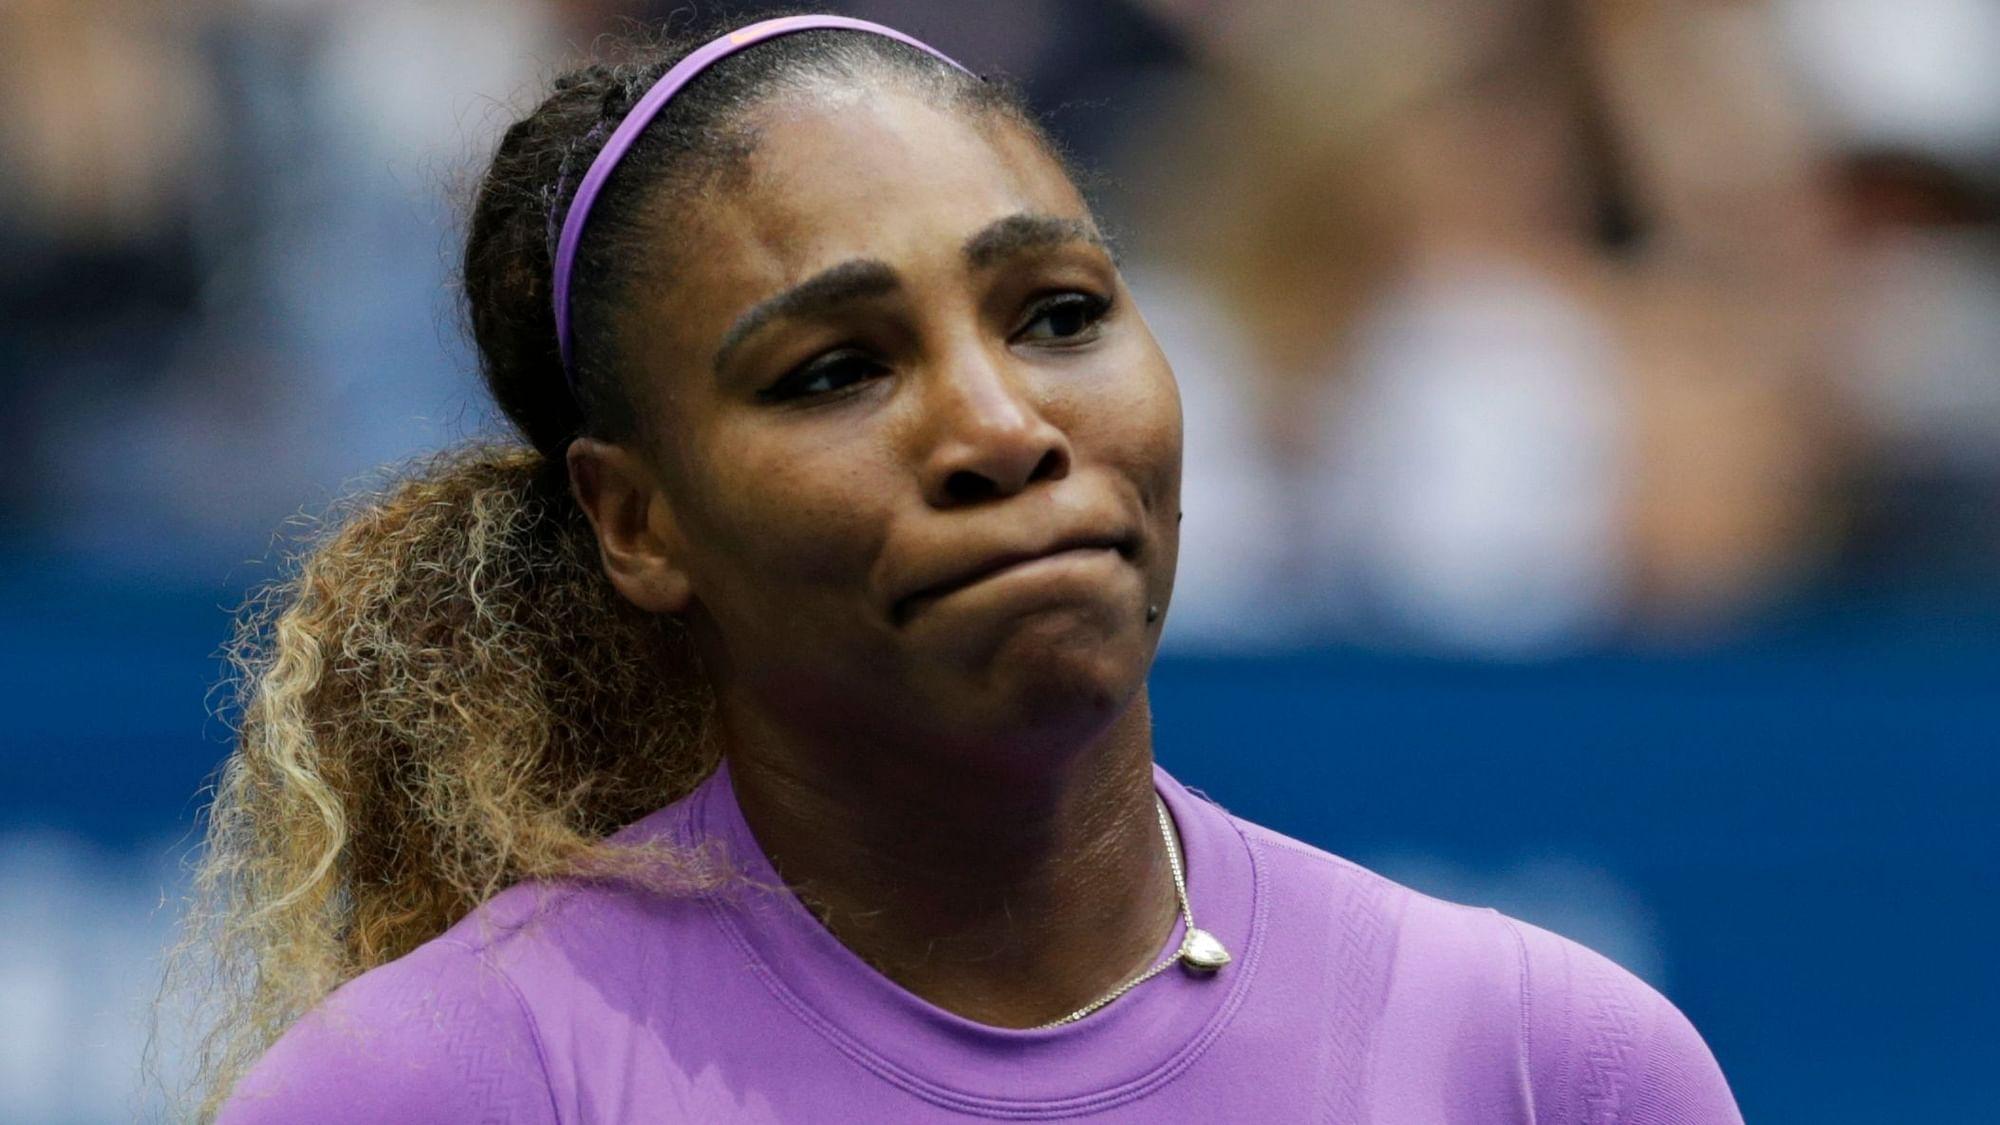 Serena 'Concerned' Over Bushfire Smoke After Past Lung Problems